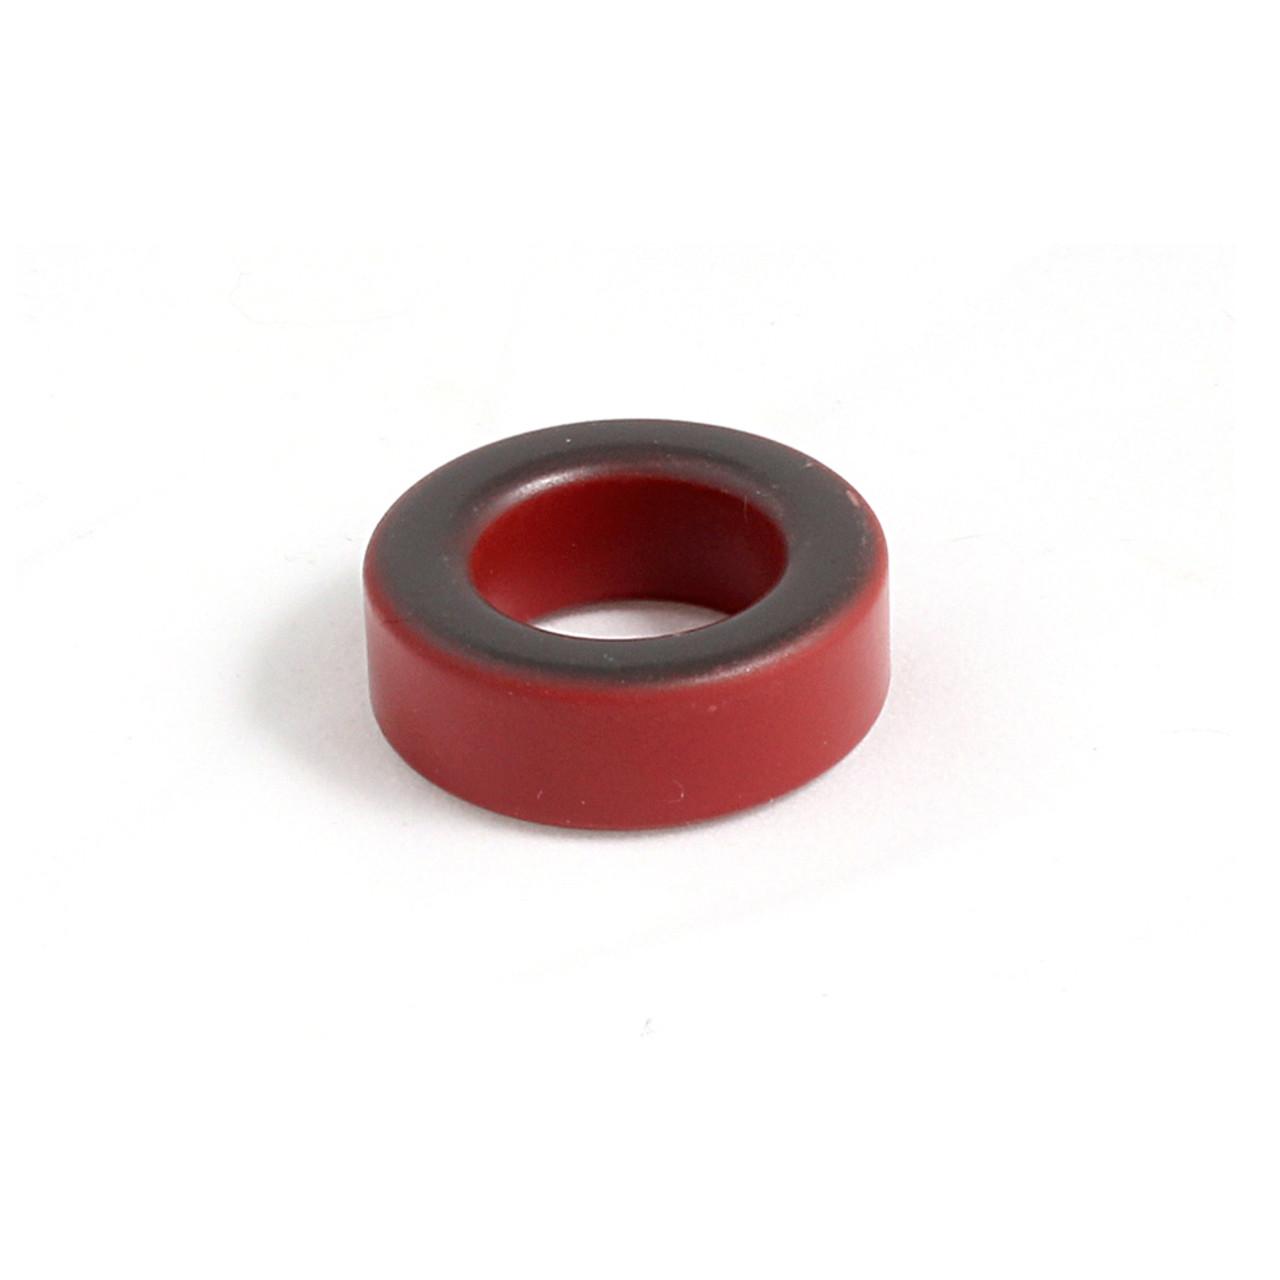 Powdered iron RF core 2-1